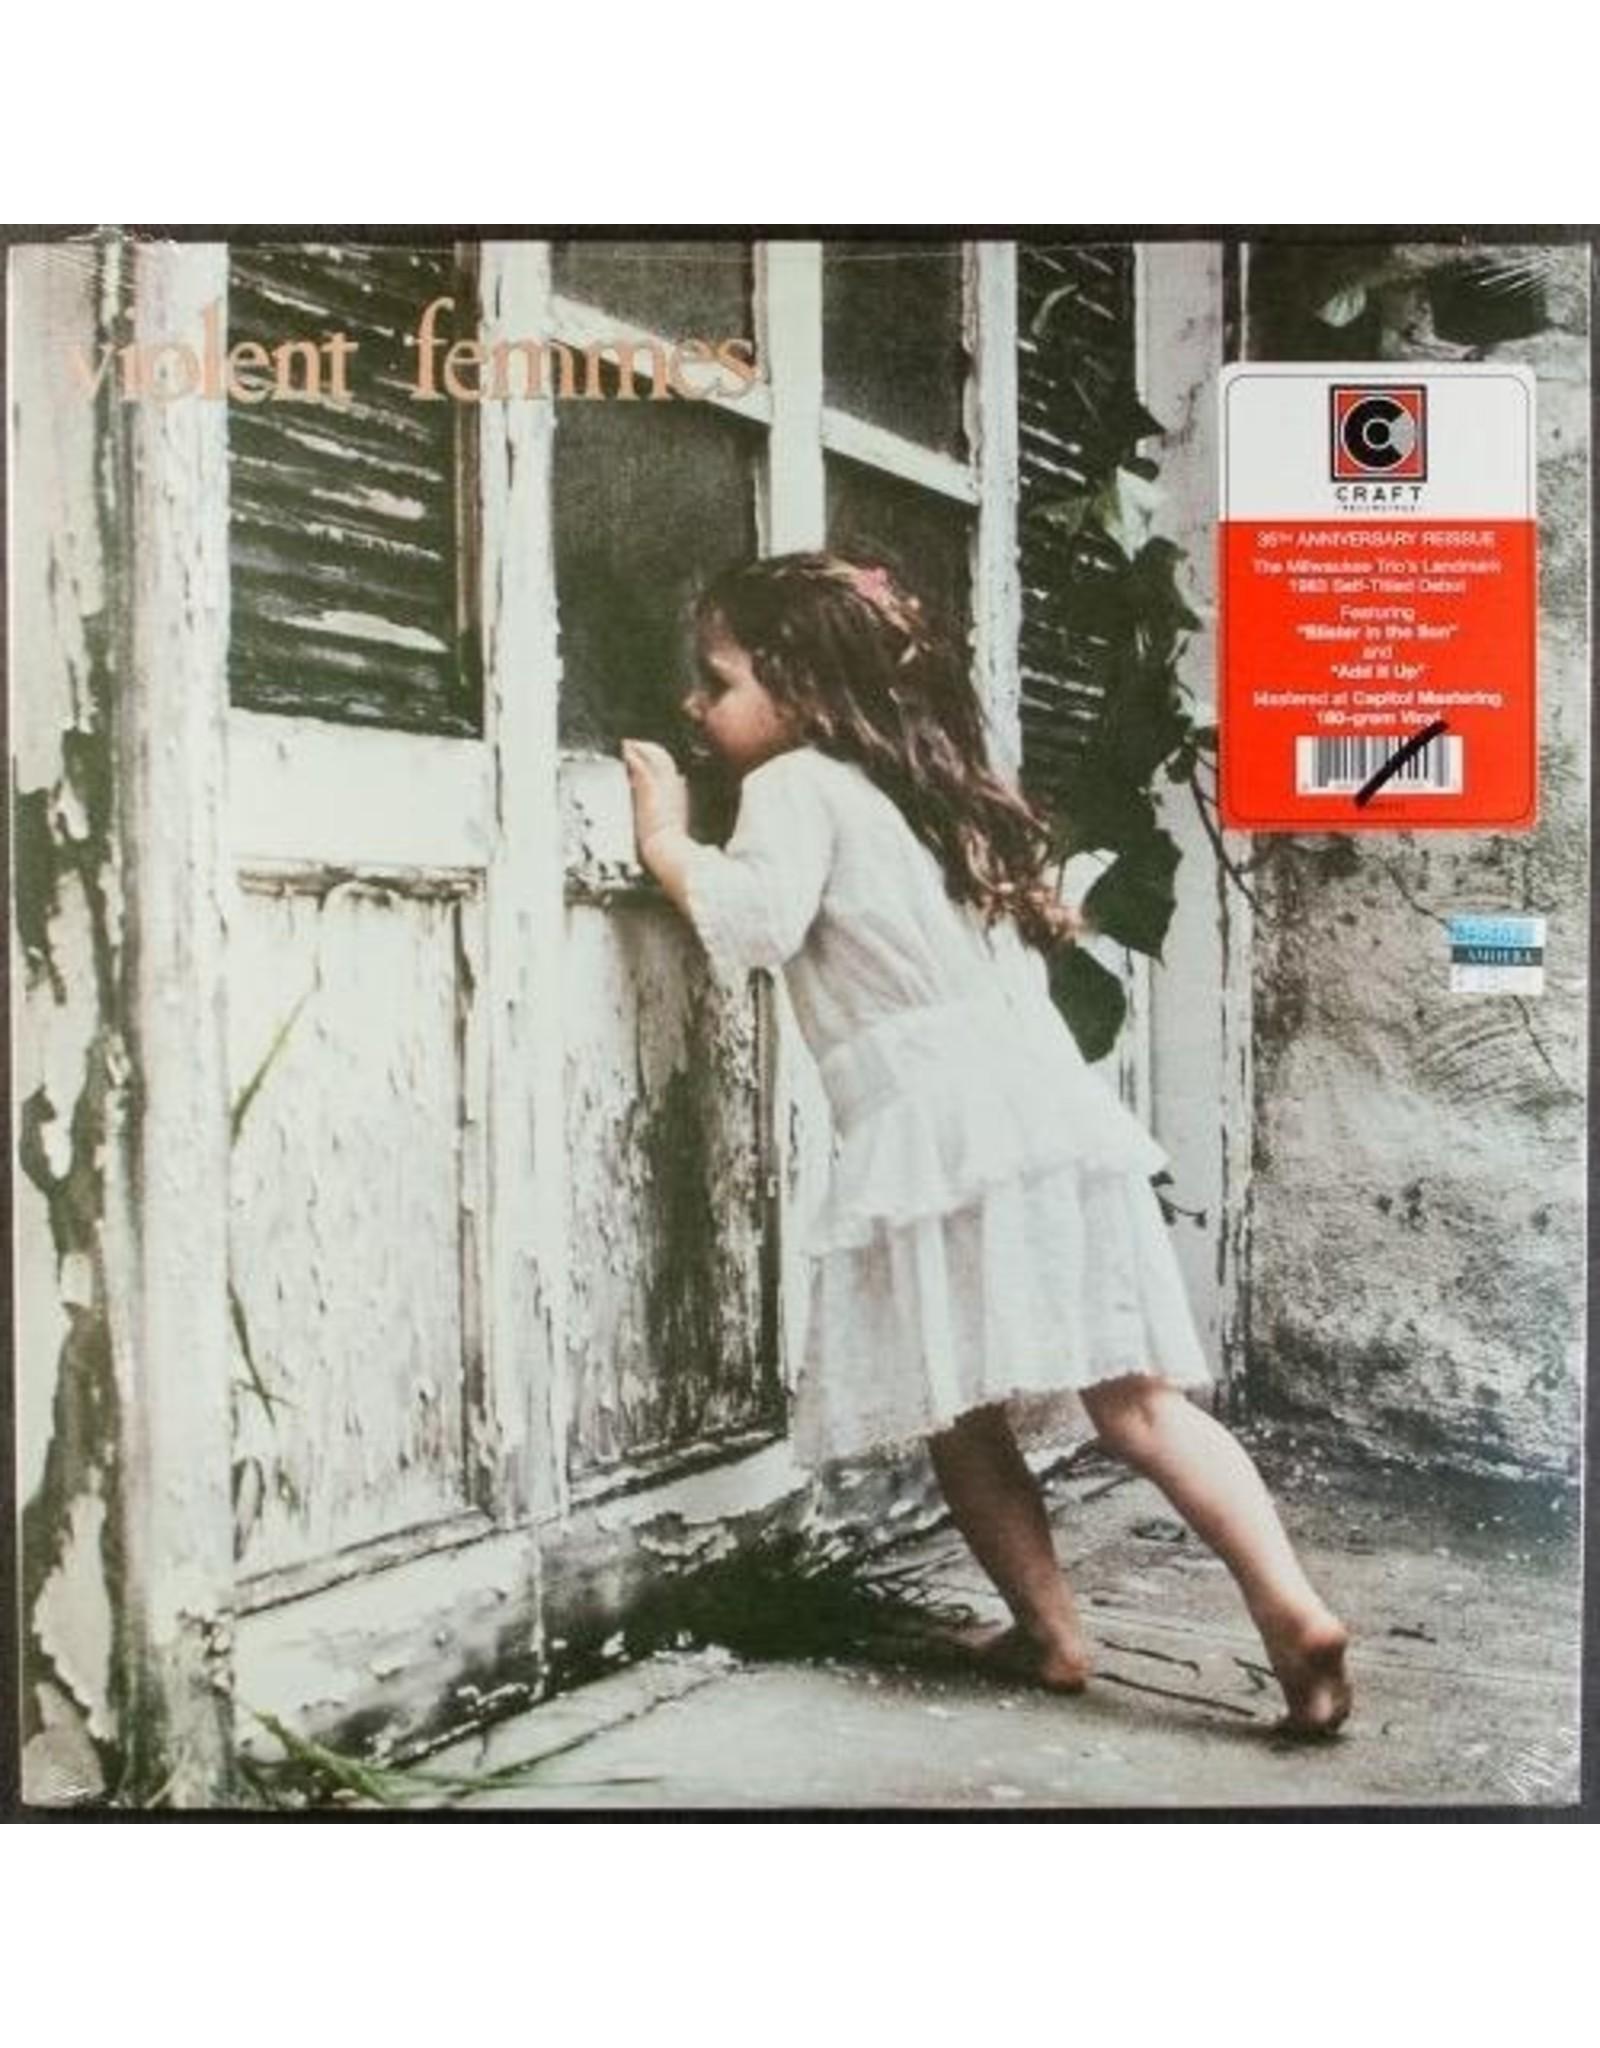 New Vinyl Violent Femmes - Hotel Last Resort LP